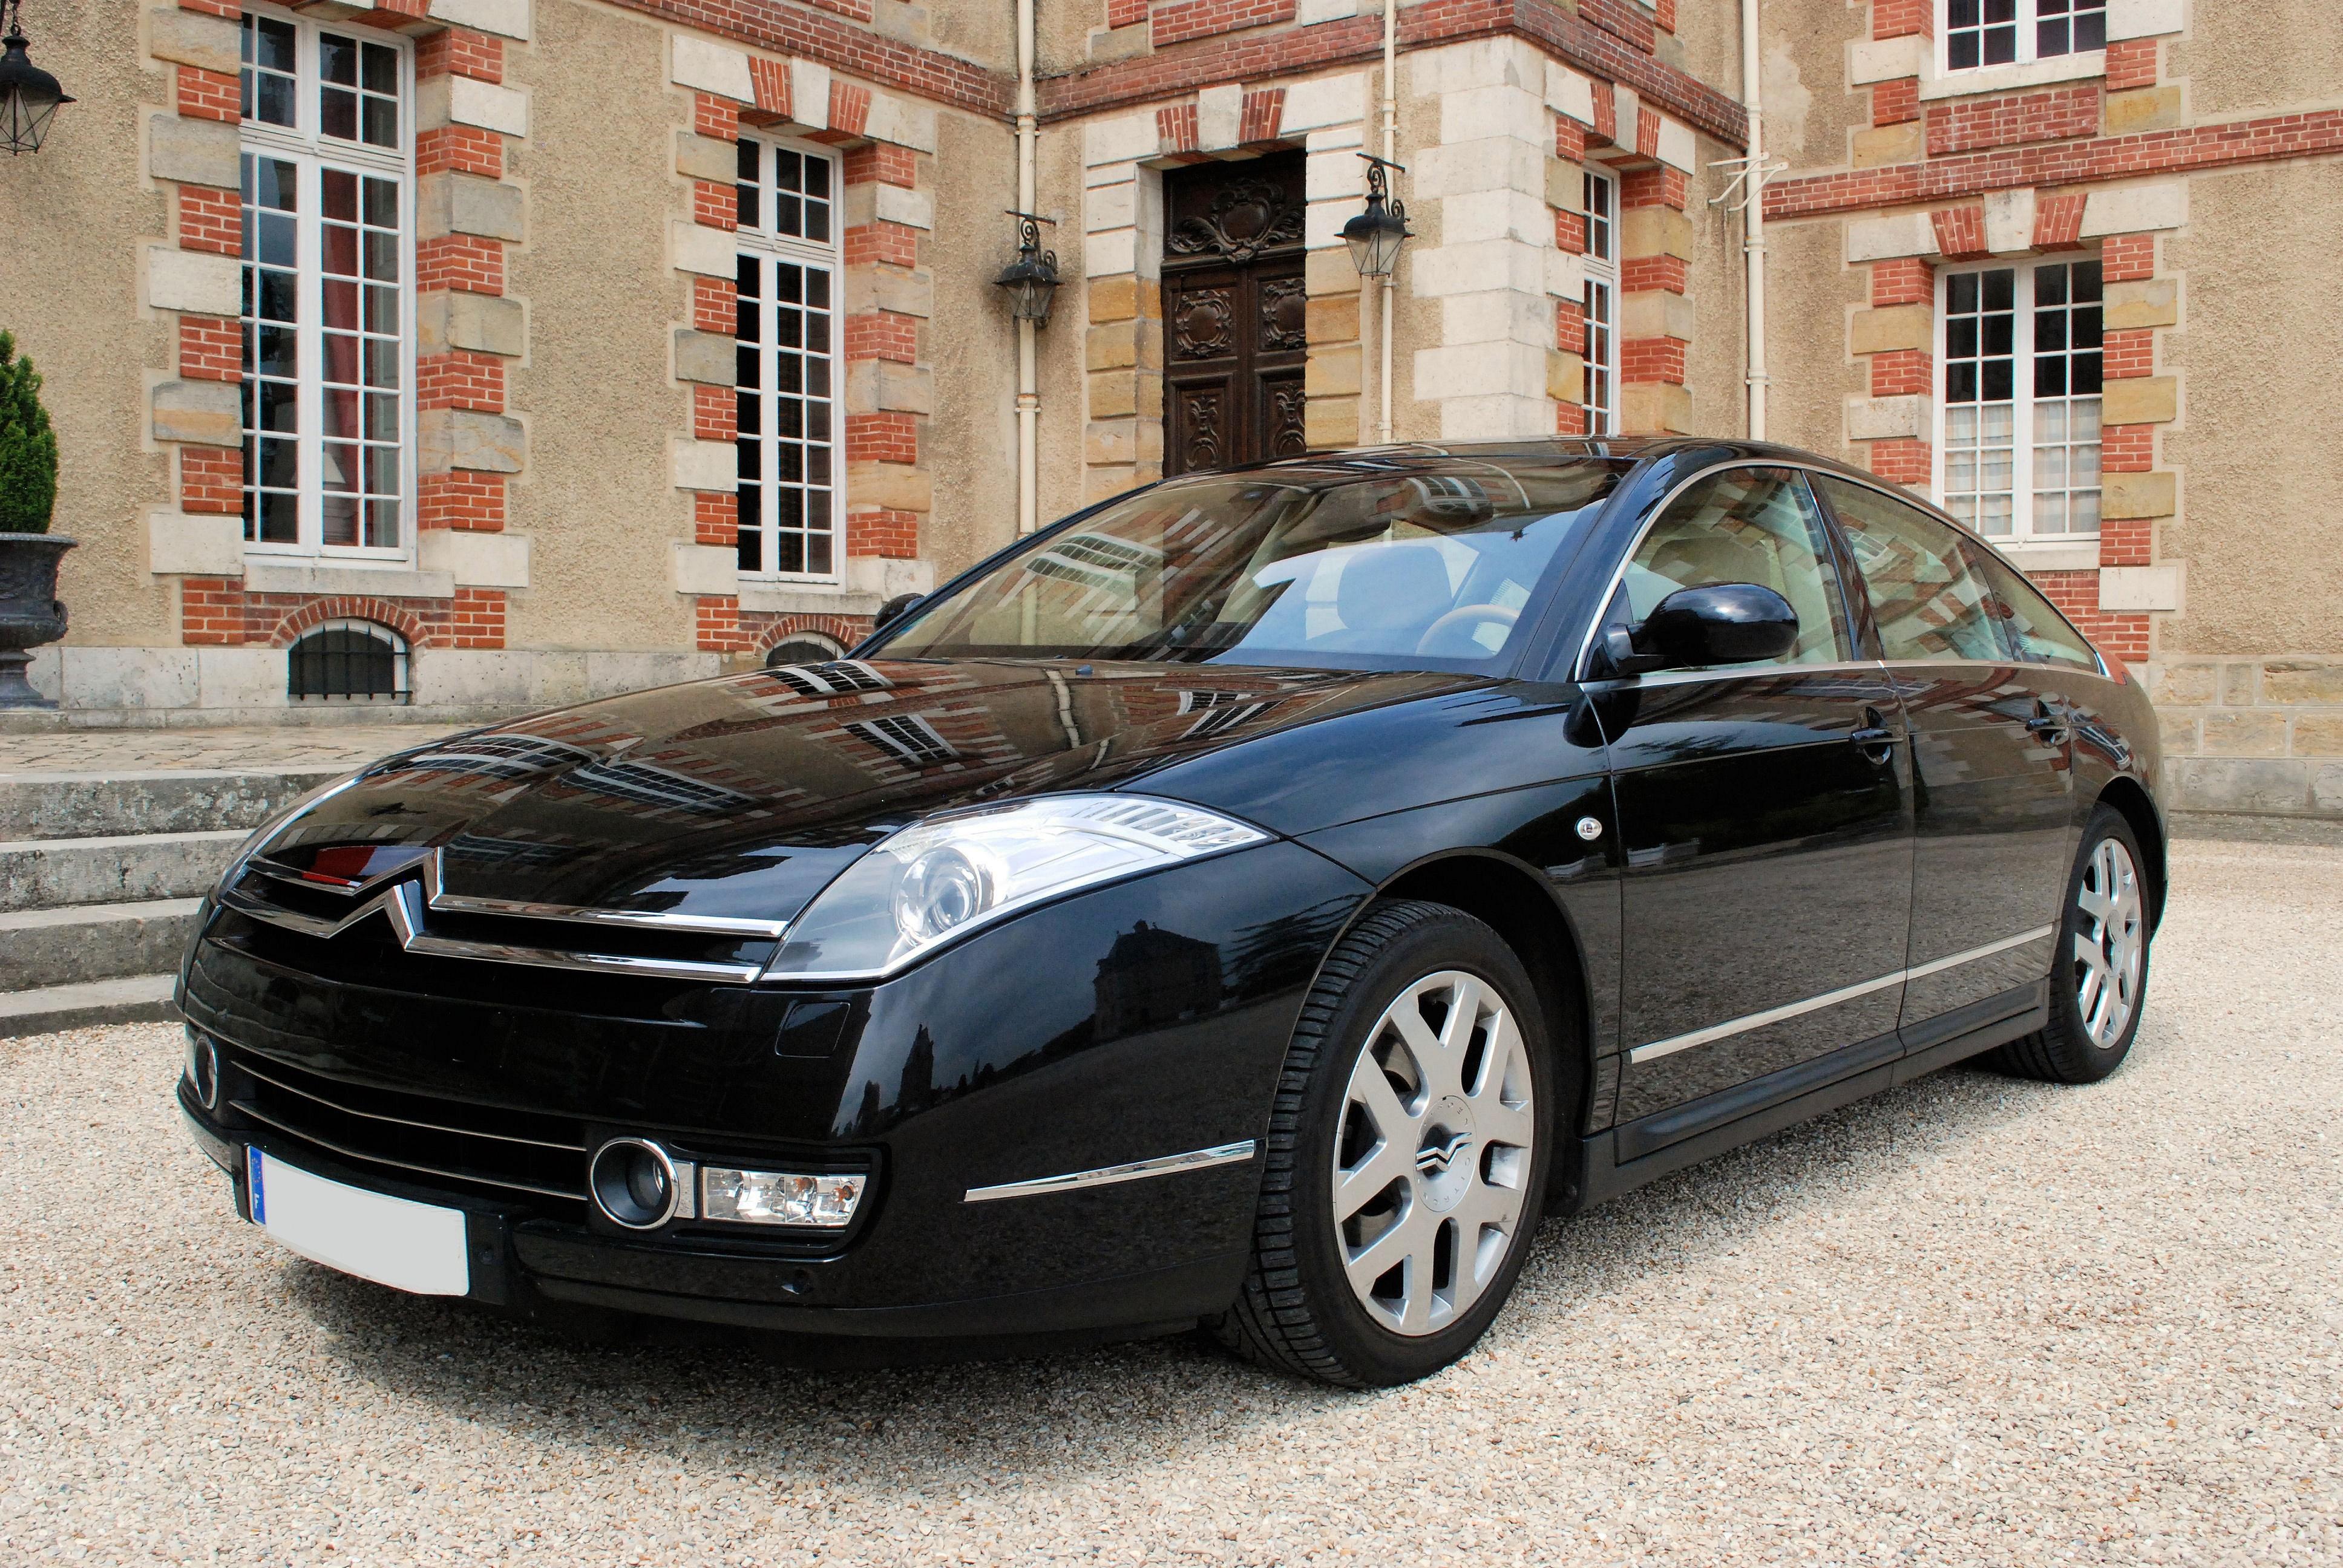 2006 Citroën C 6 diesel V6 Hdi 2.7 l